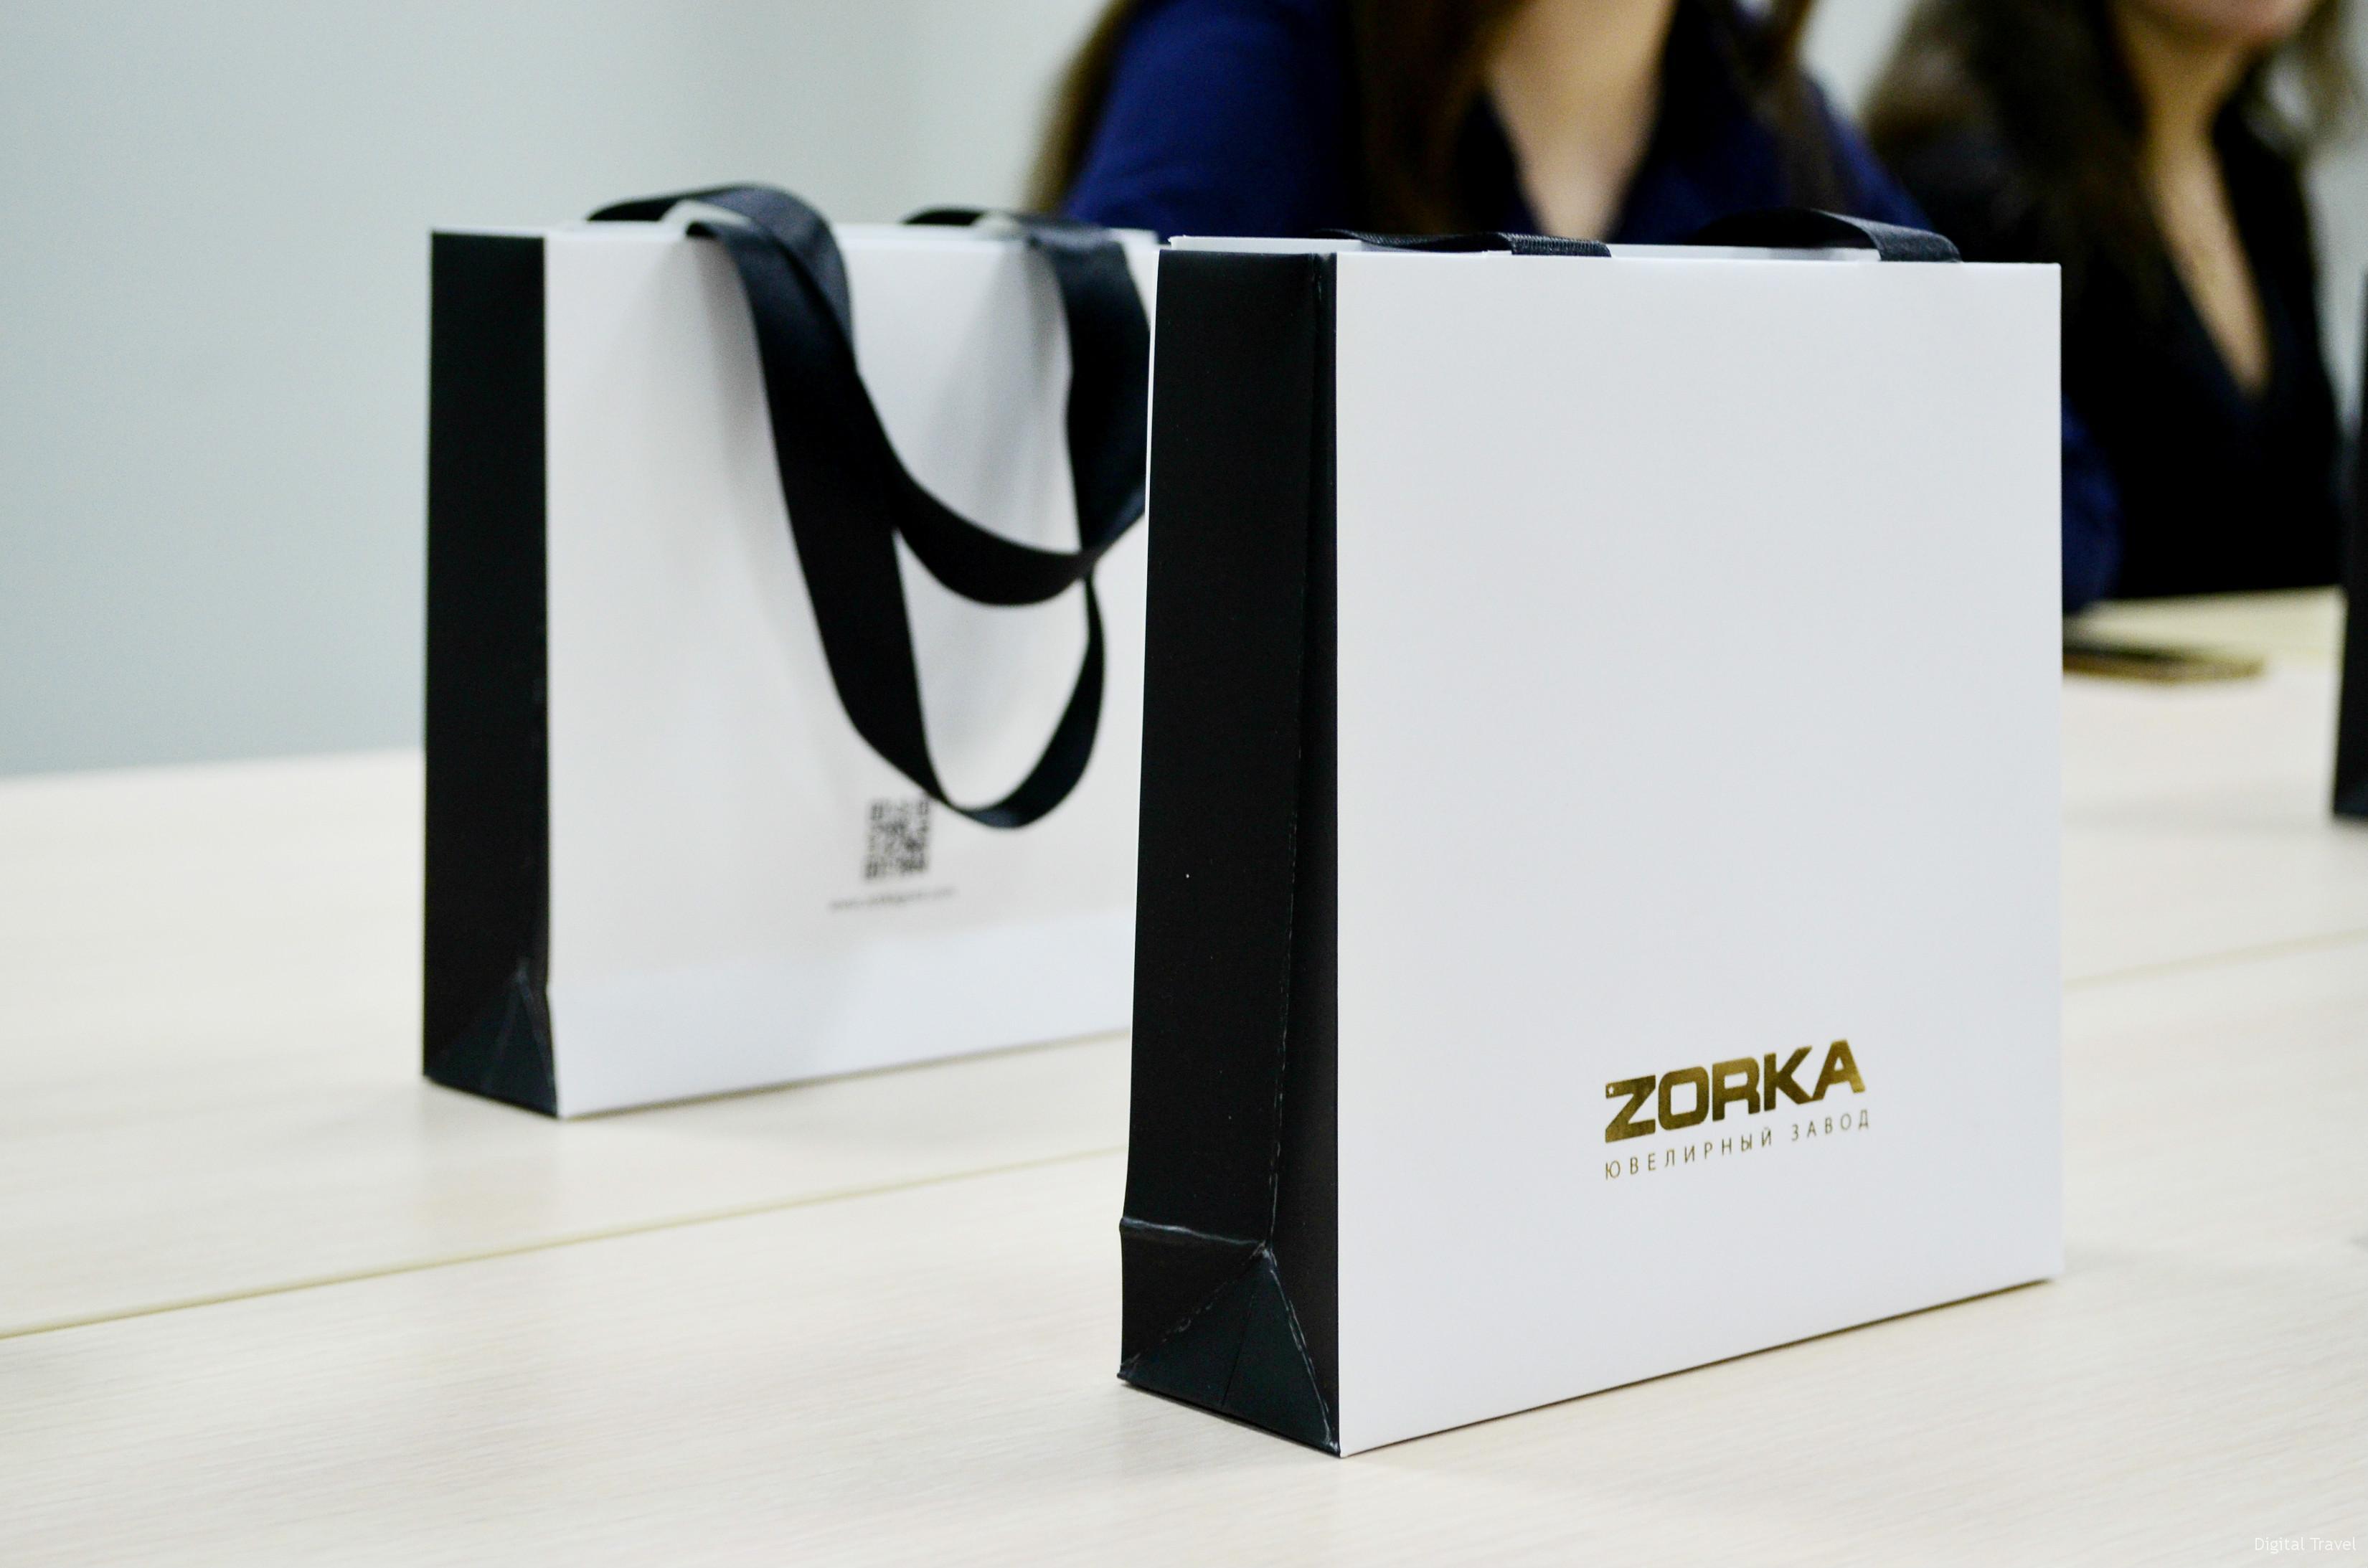 ccd5693d06b4 Ювелирный завод ZORKA предложил турагентам Беларуси сотрудничество    Digital Travel